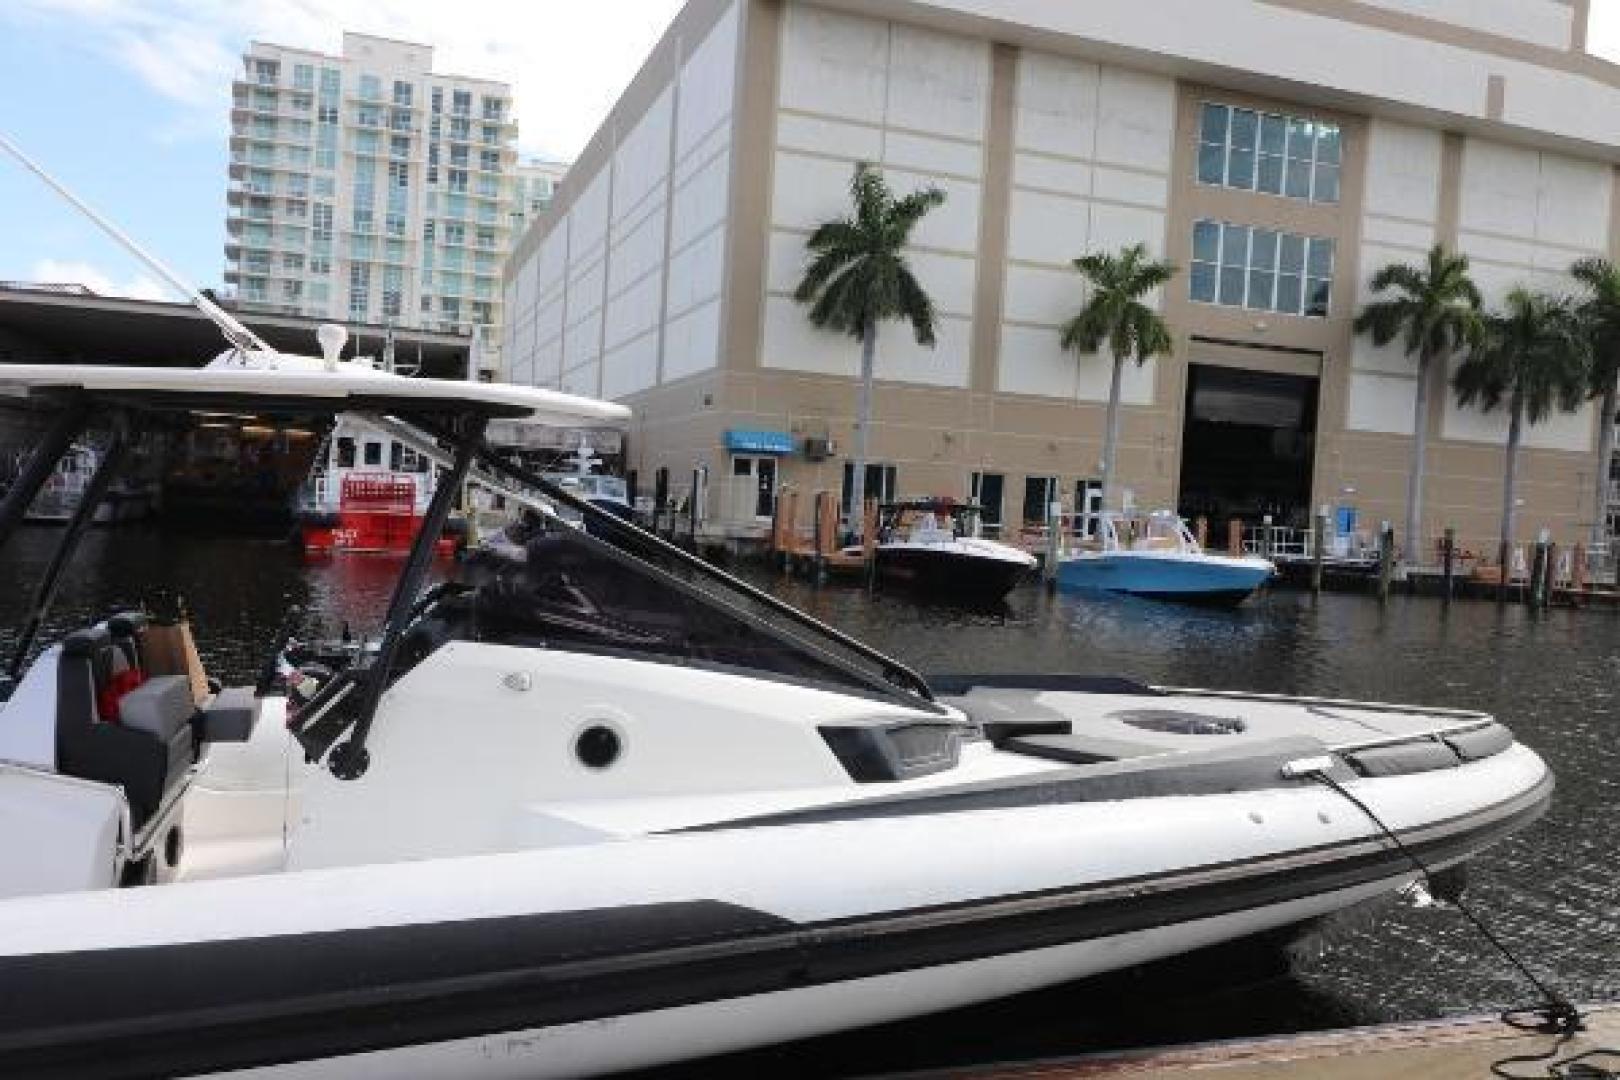 Sacs-Strider 40 ESSE R 2016-Sacs Strider 40 ESSE R Fort Lauderdale-Florida-United States-1533424   Thumbnail